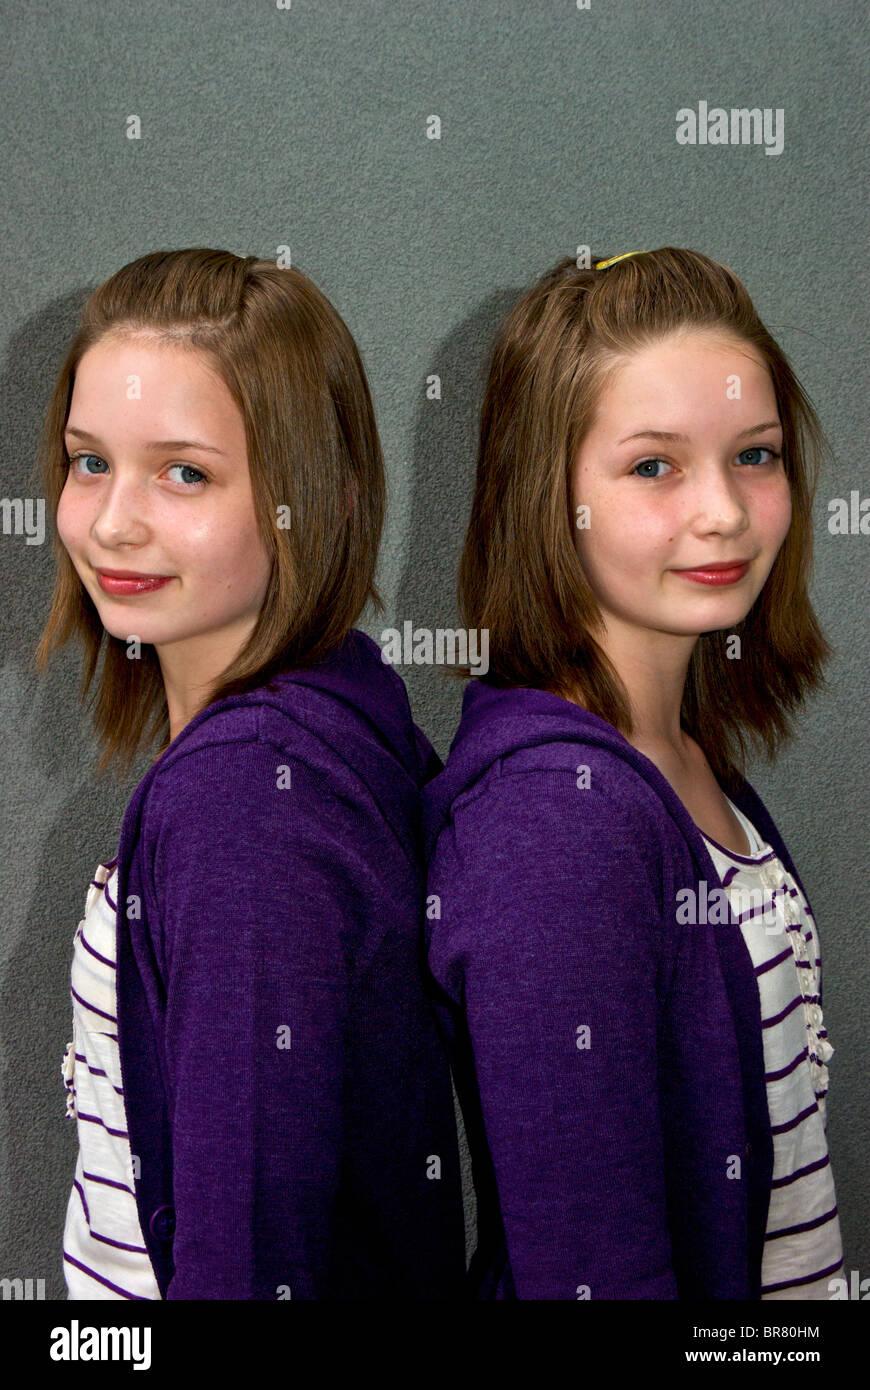 identical-teenage-twin-girls